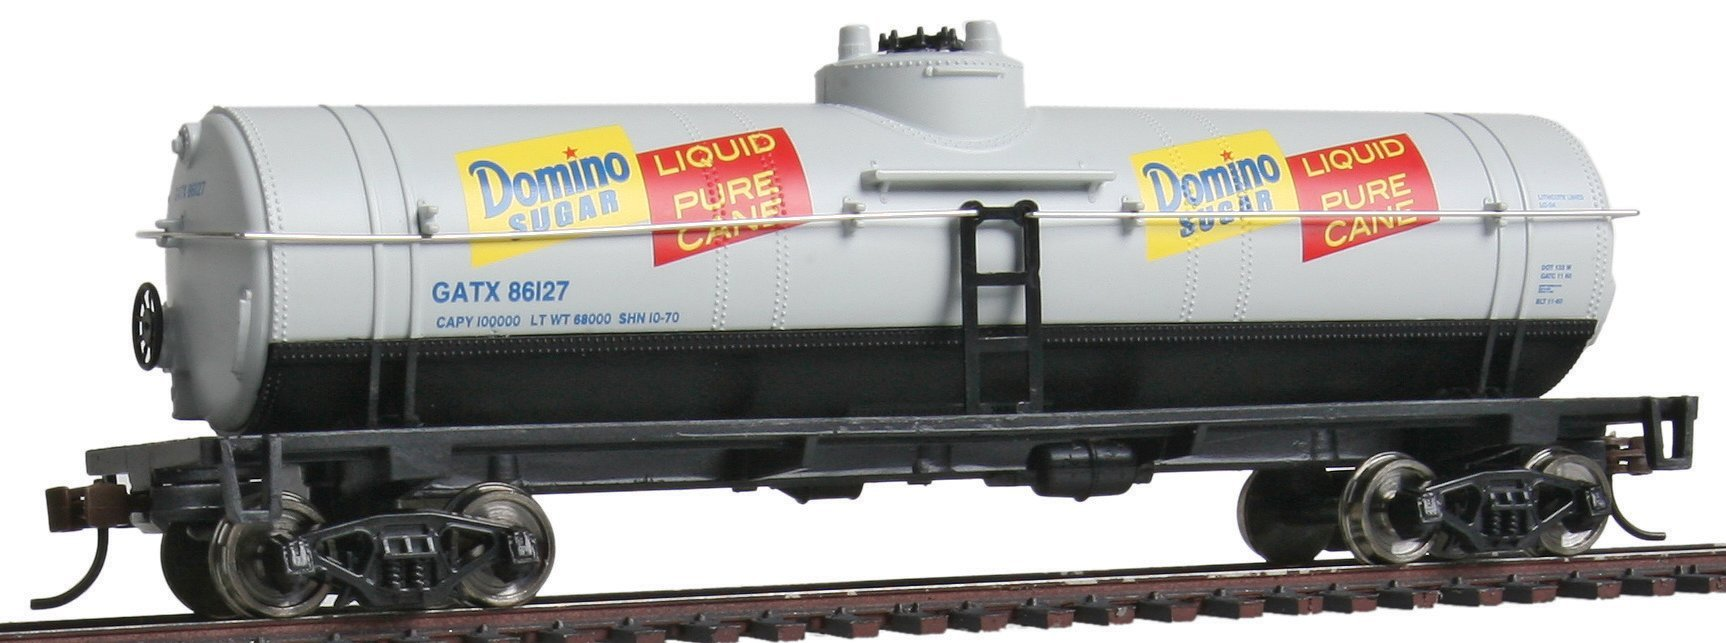 Walthers Trainline 40' Tank Car - Ready to Run Domino Sugar GATX 86127